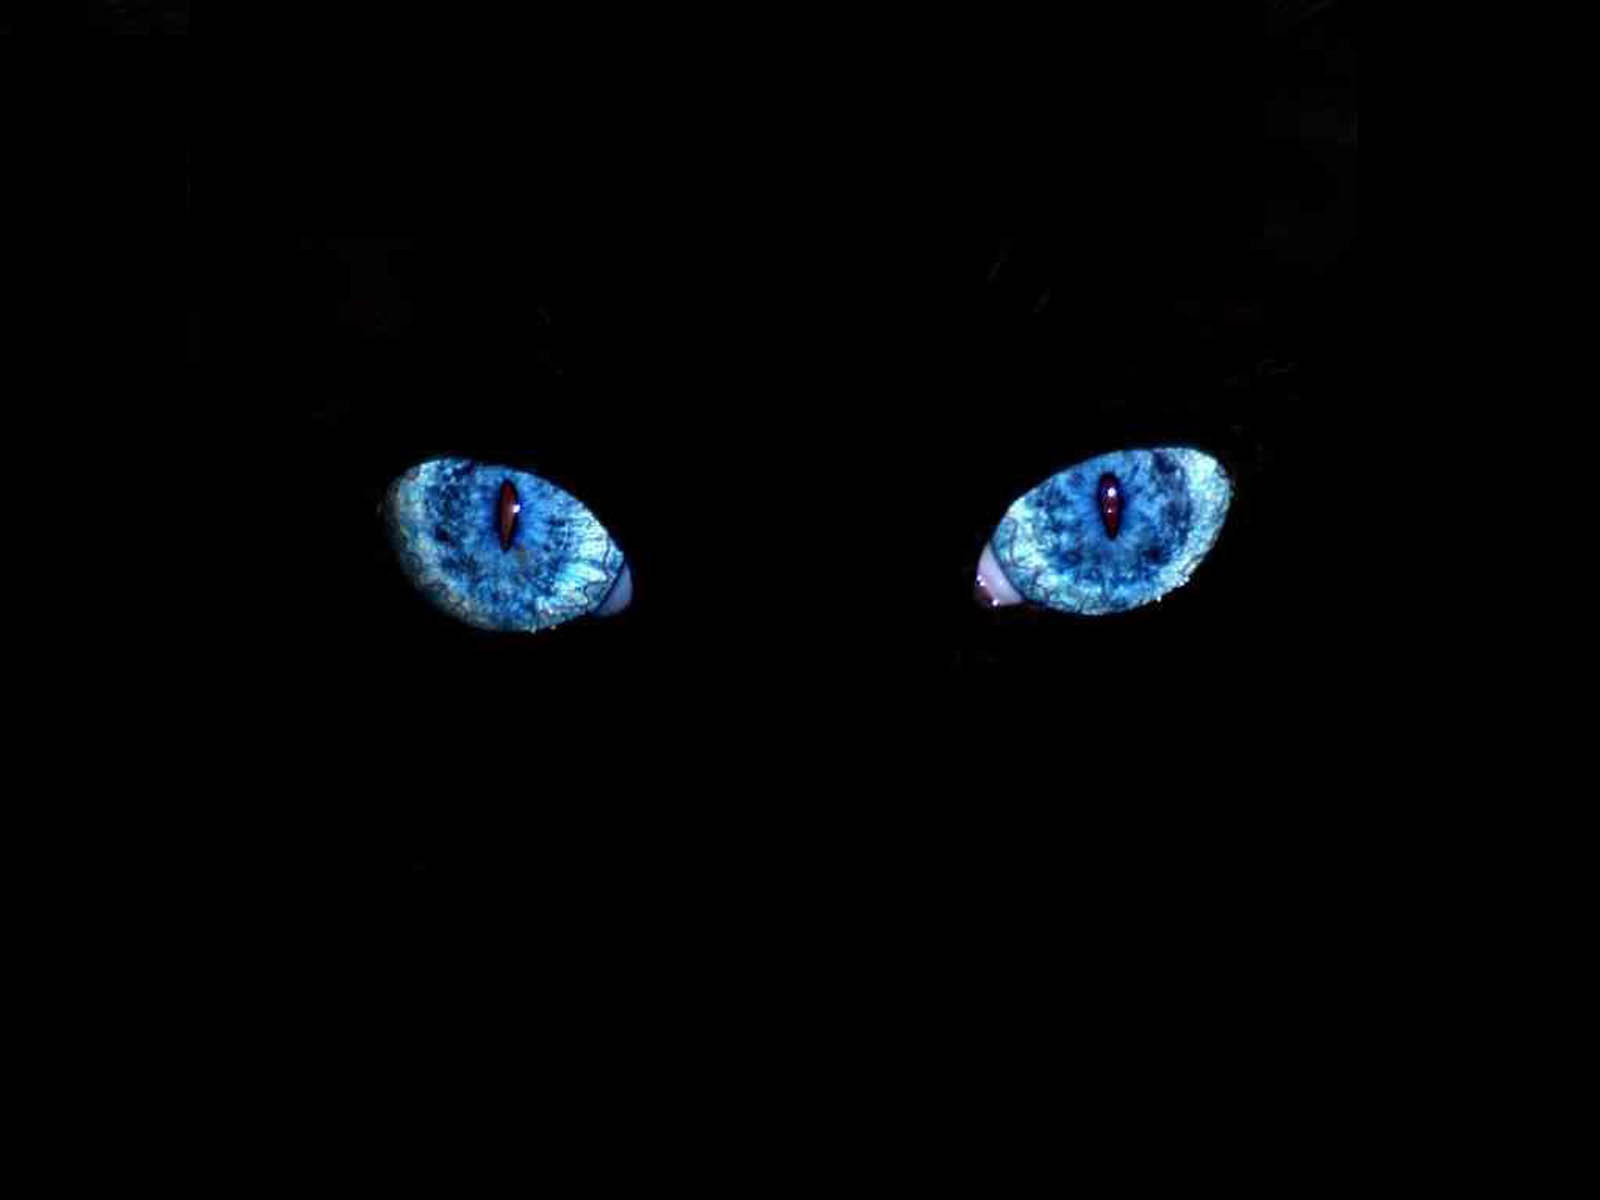 wallpaper black cat blue eyes